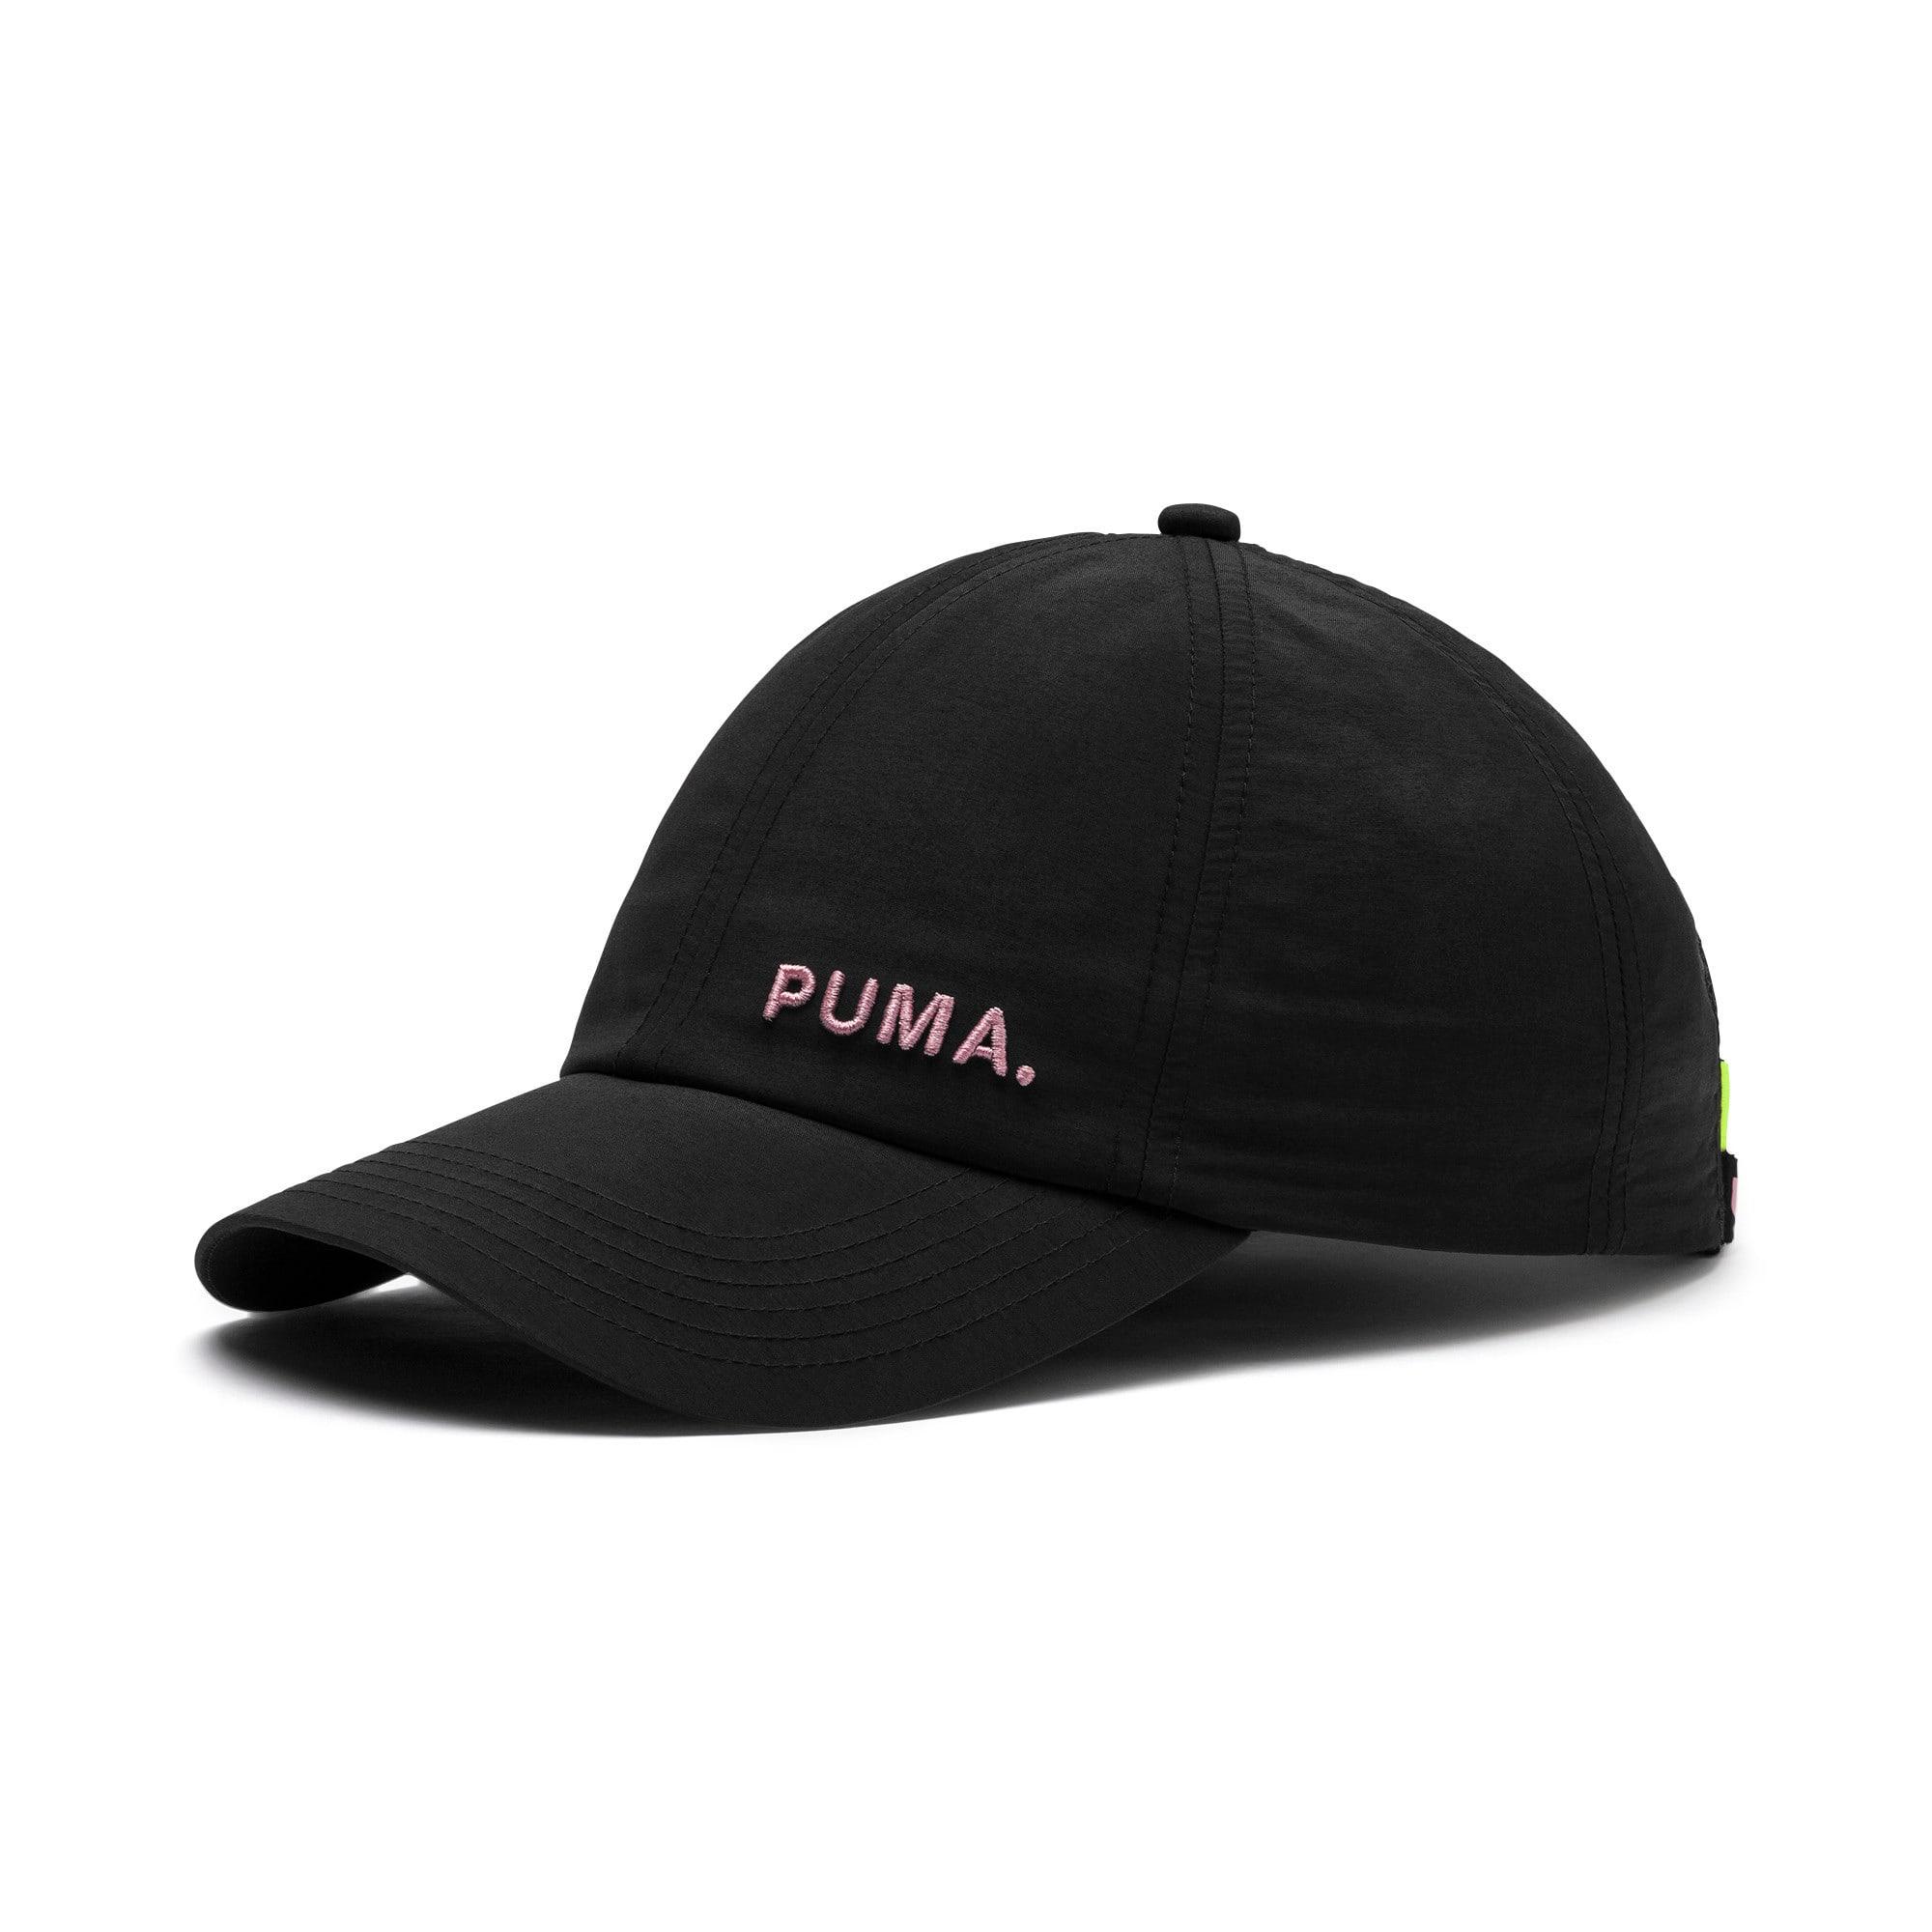 Thumbnail 1 of Shift Women's Cap, Puma Black-Bridal Rose, medium